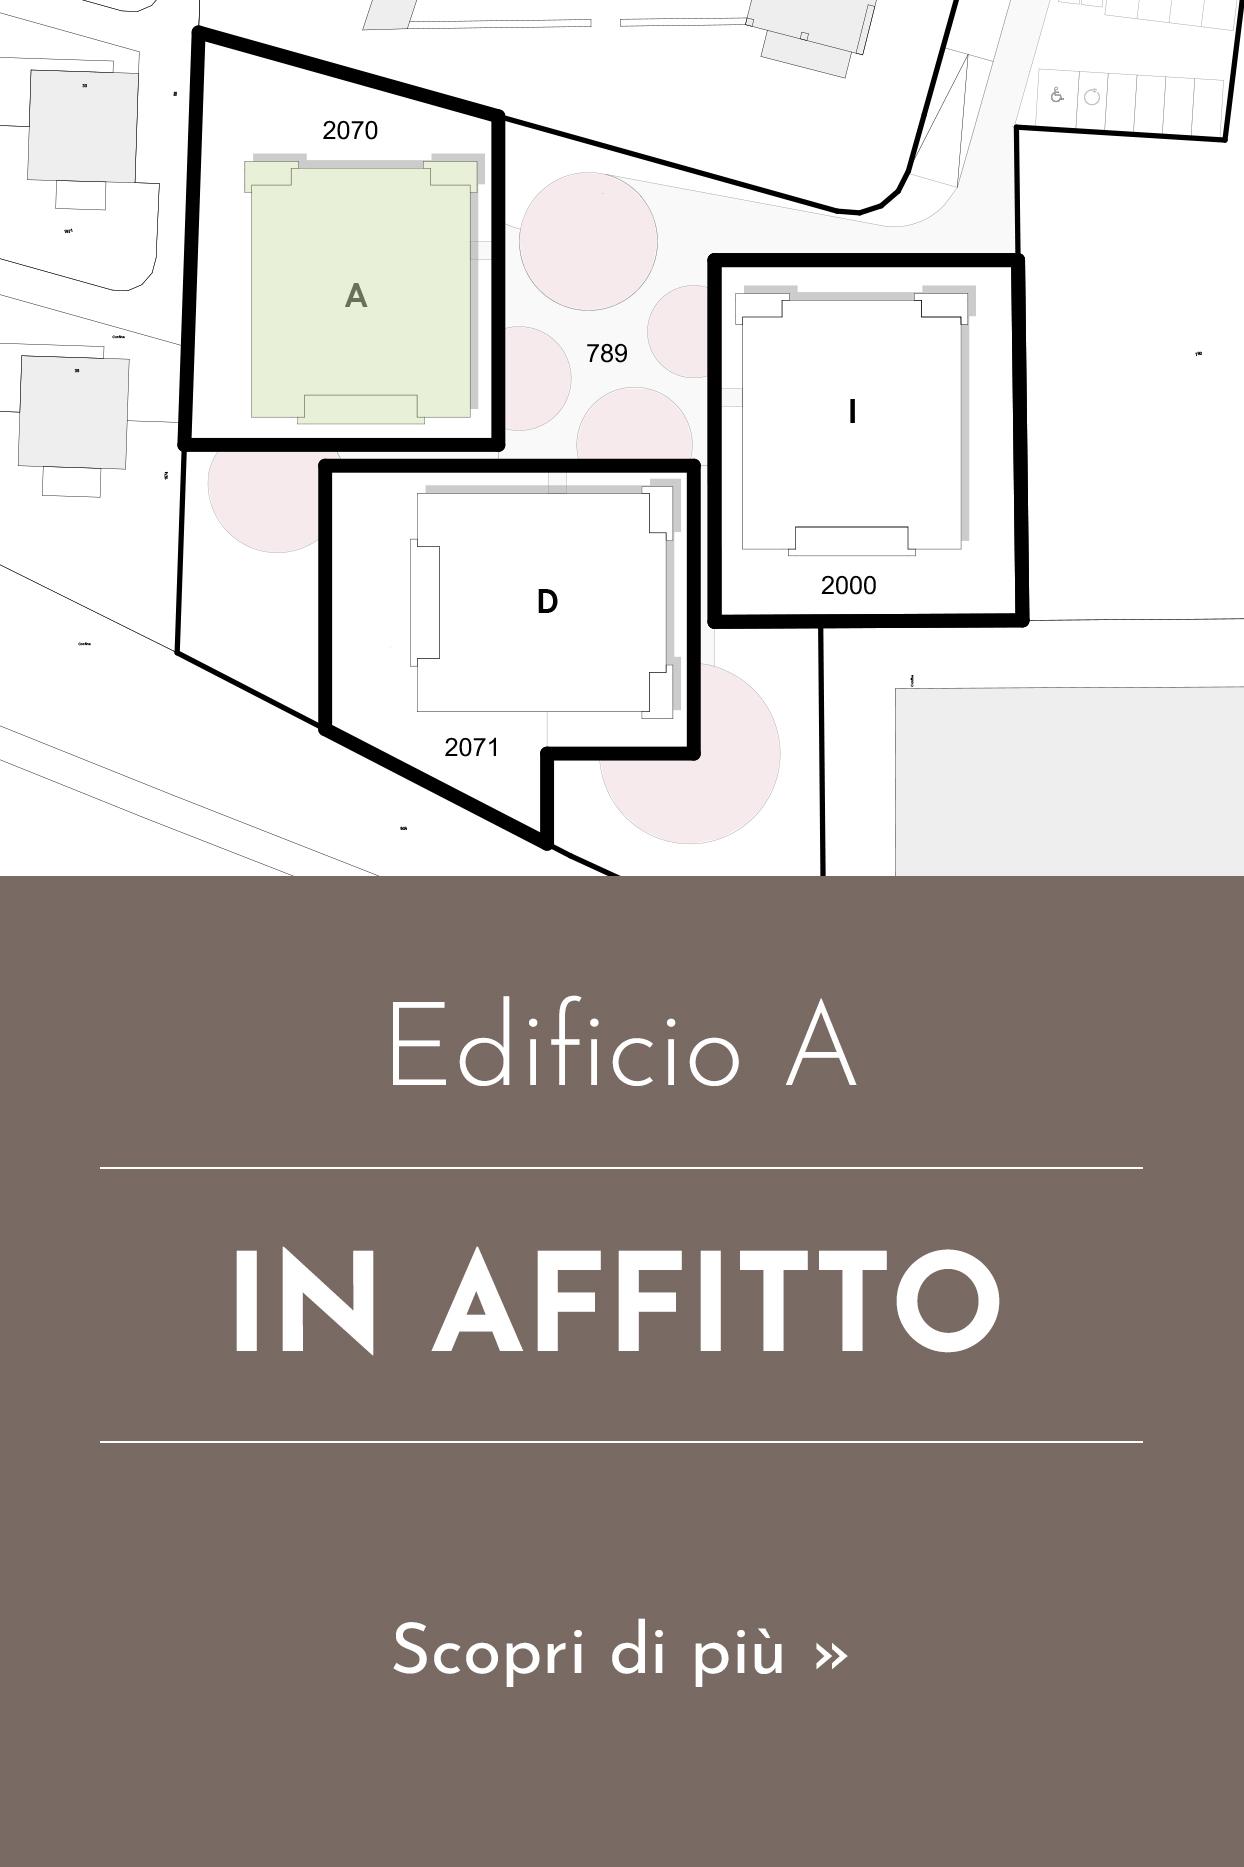 IDA_Blocco_Edificio_A.jpg